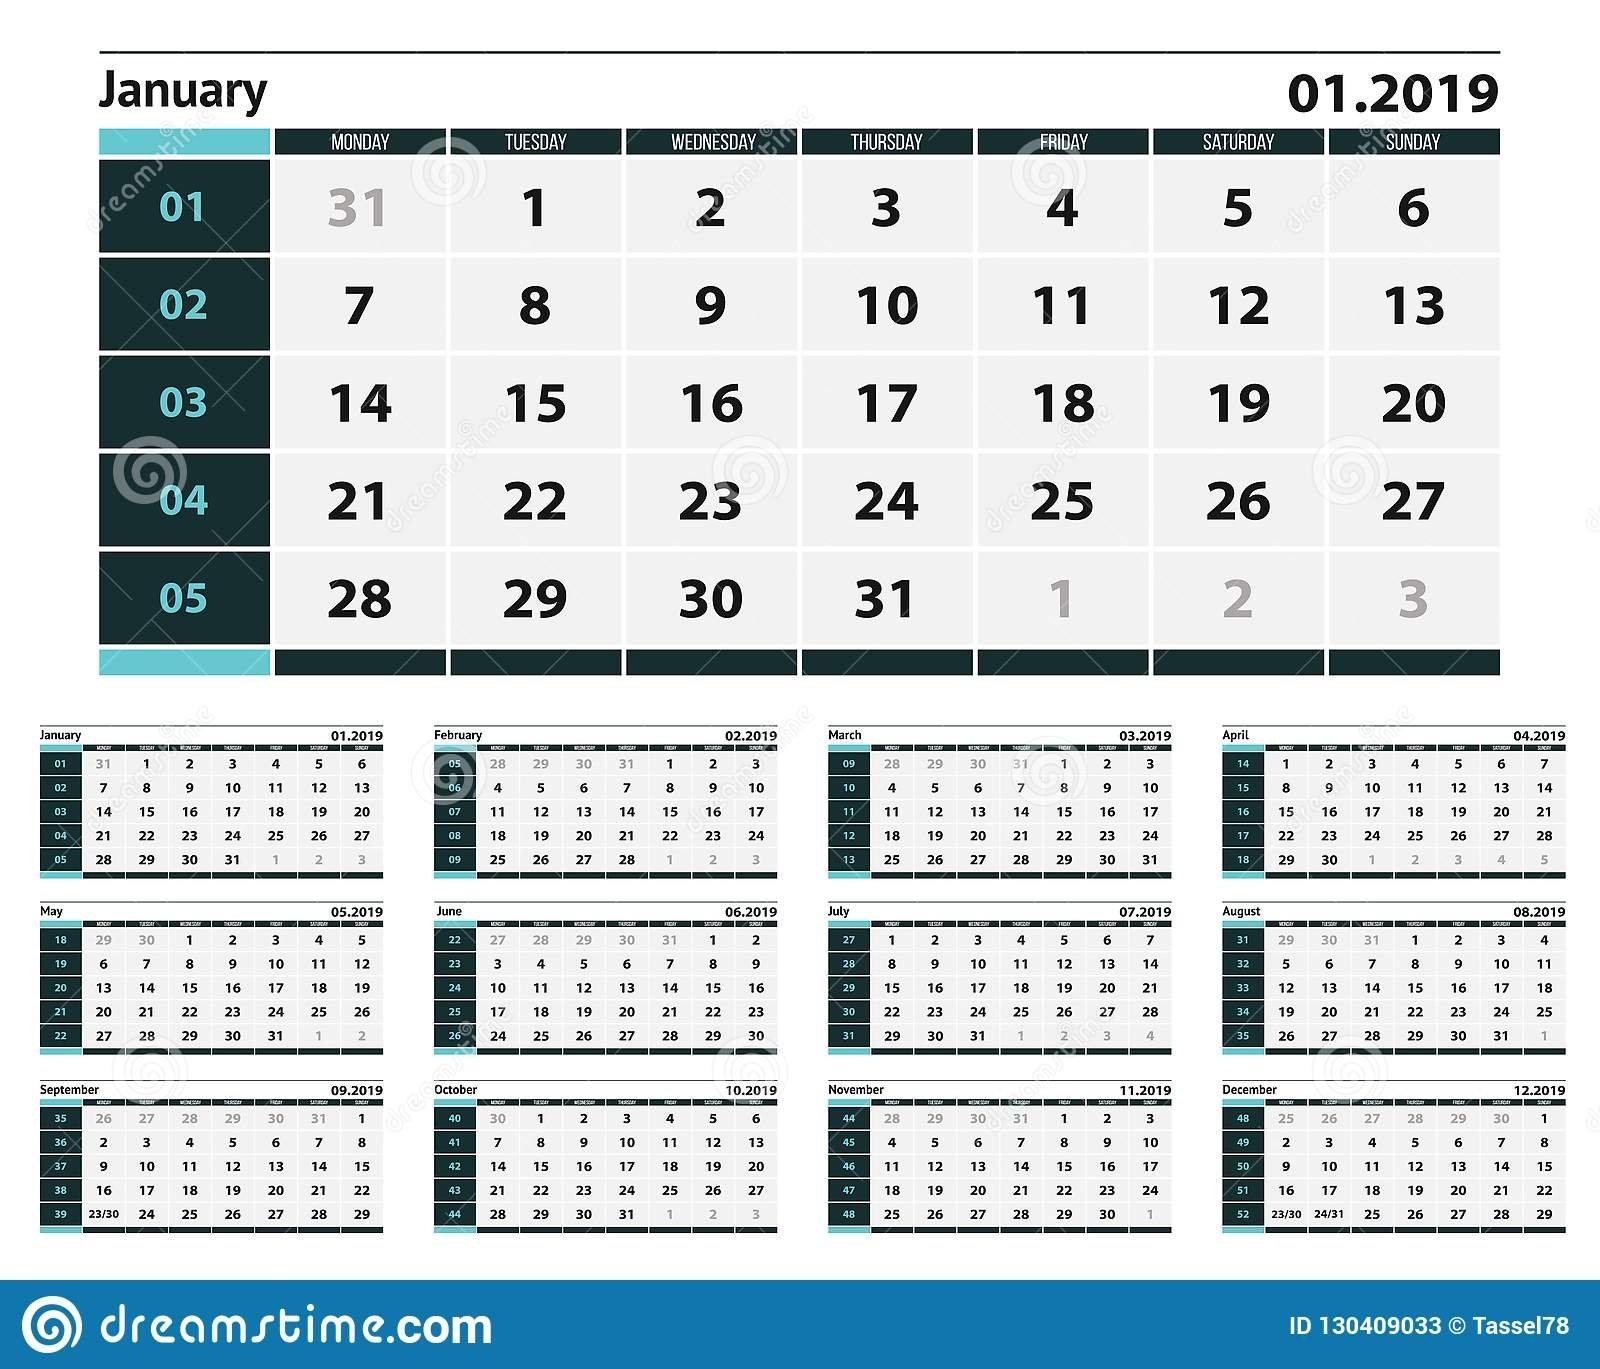 Simple Blue And Grey Calendar Design For 2019. Stock Vector Calendar 02/2019